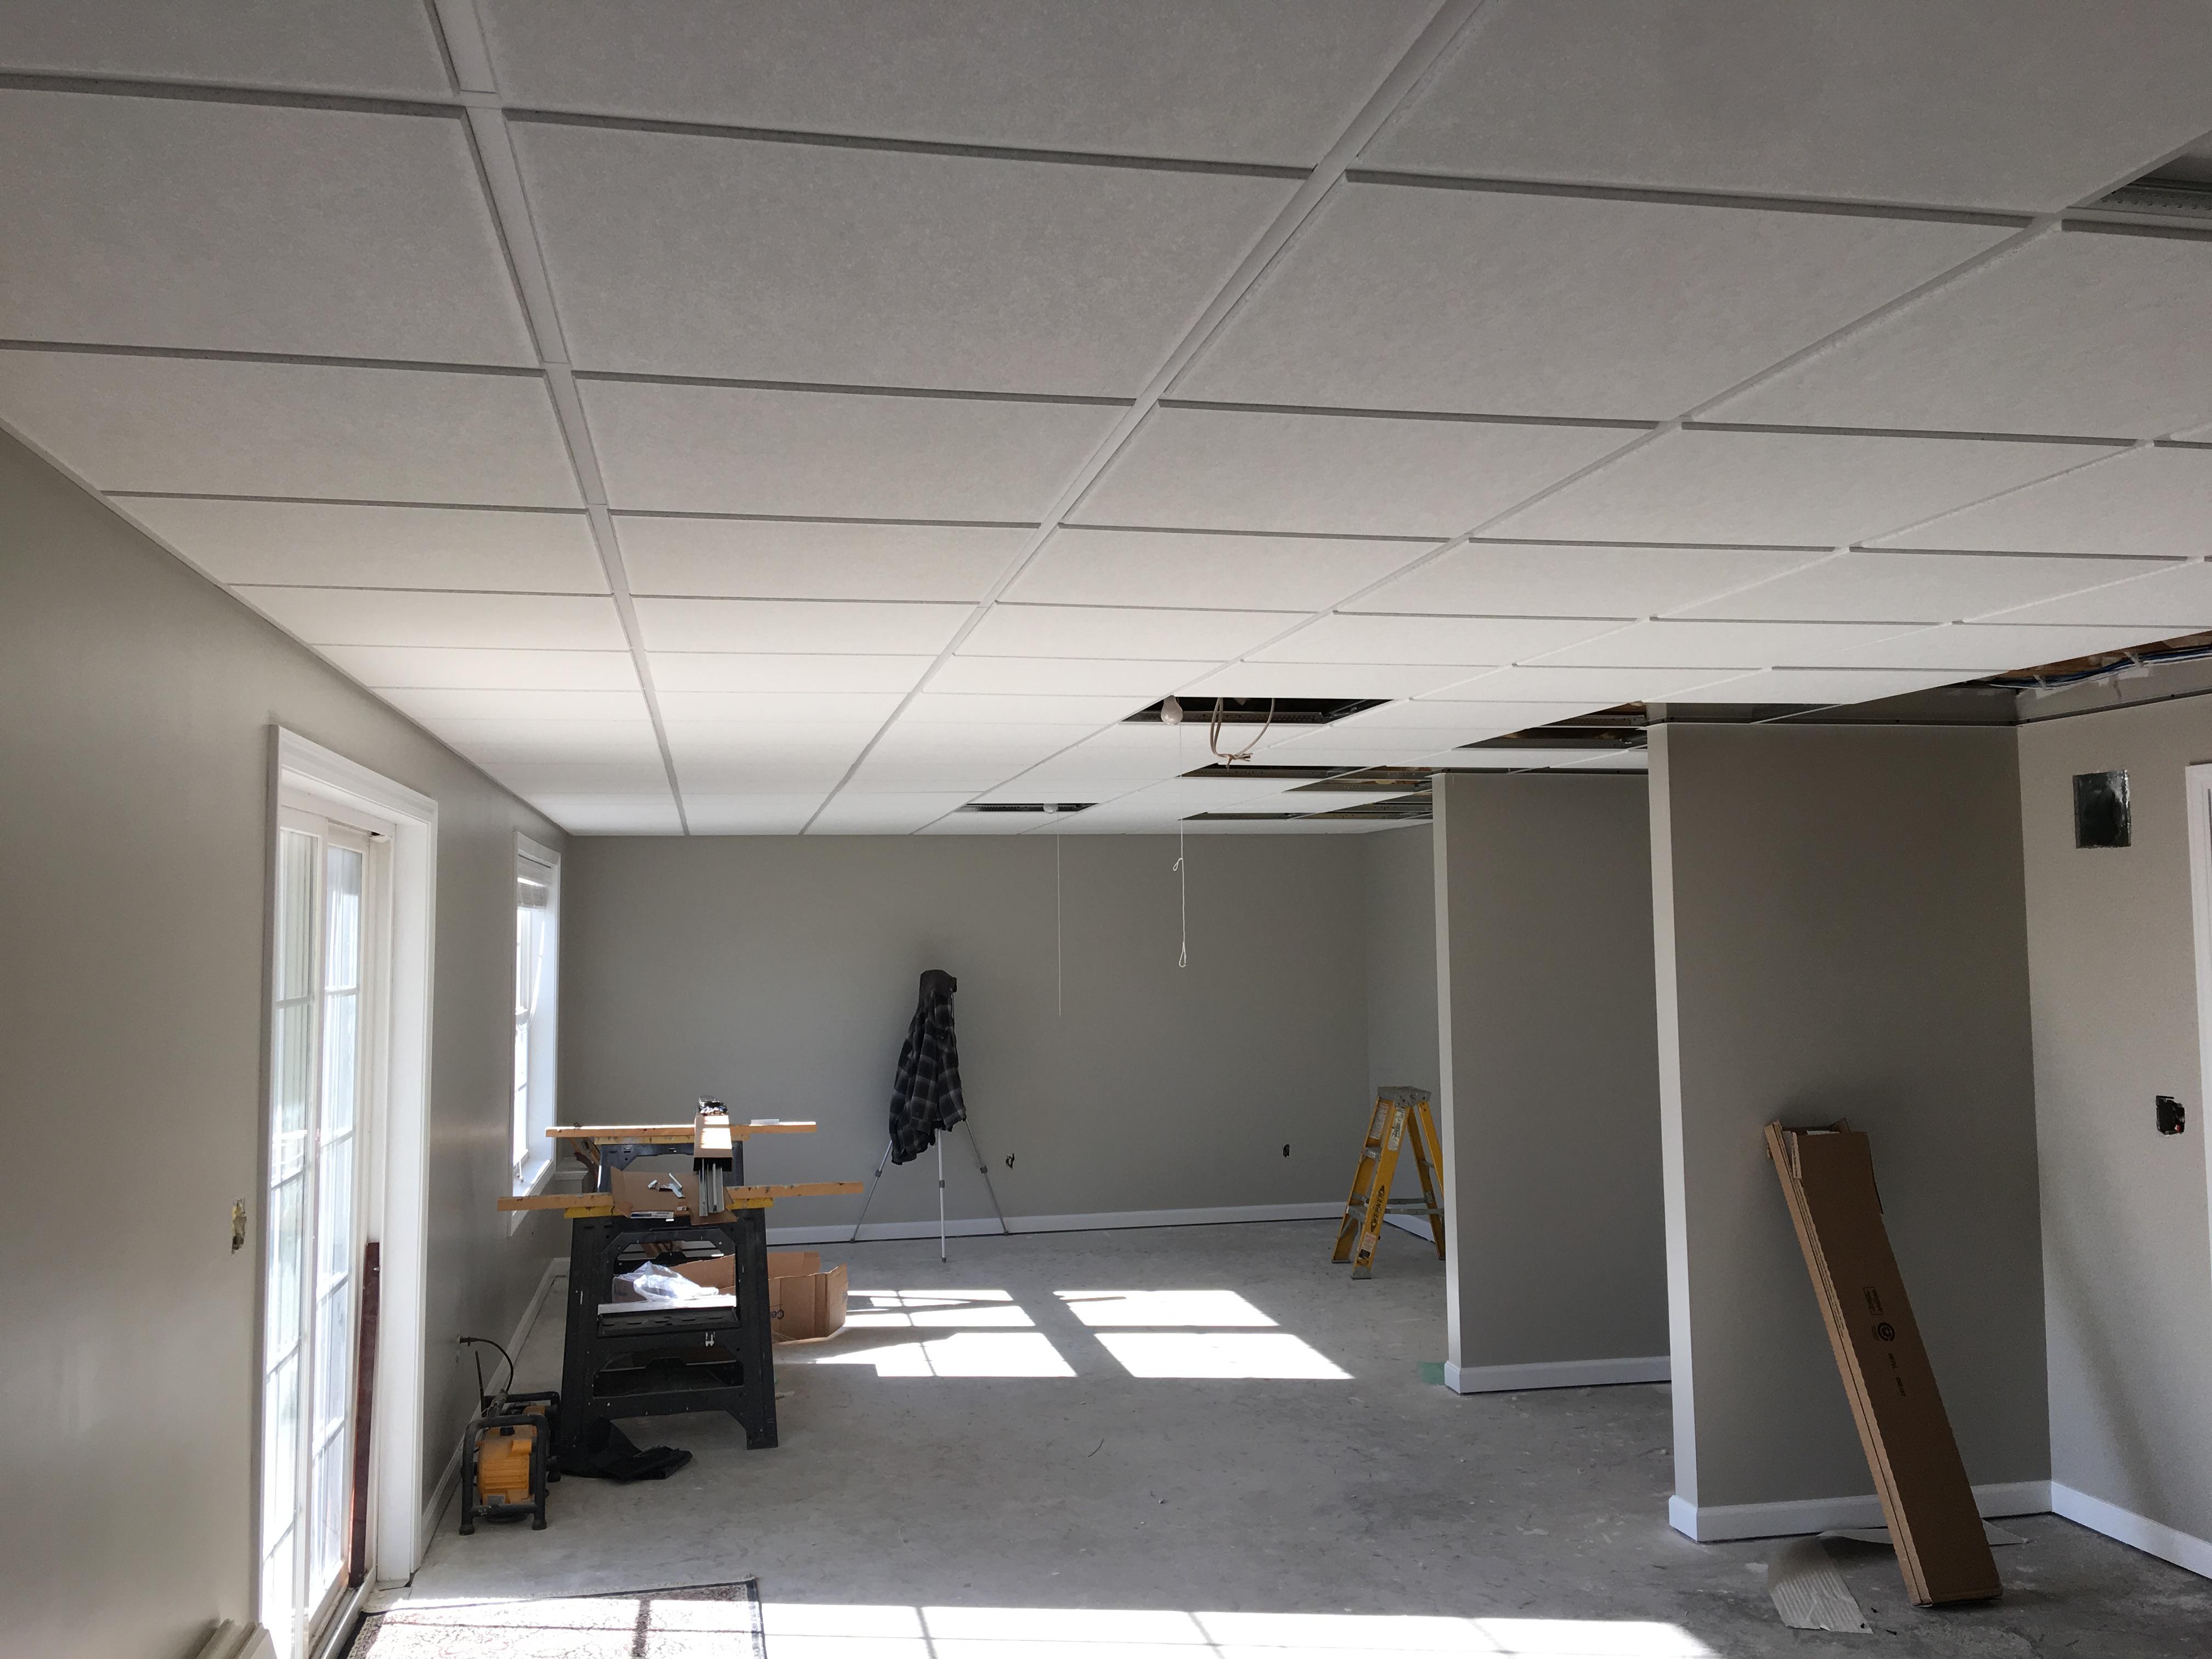 Finished basement-30ce785a-d3c9-43f5-a612-6b5e25a8ed43.jpeg